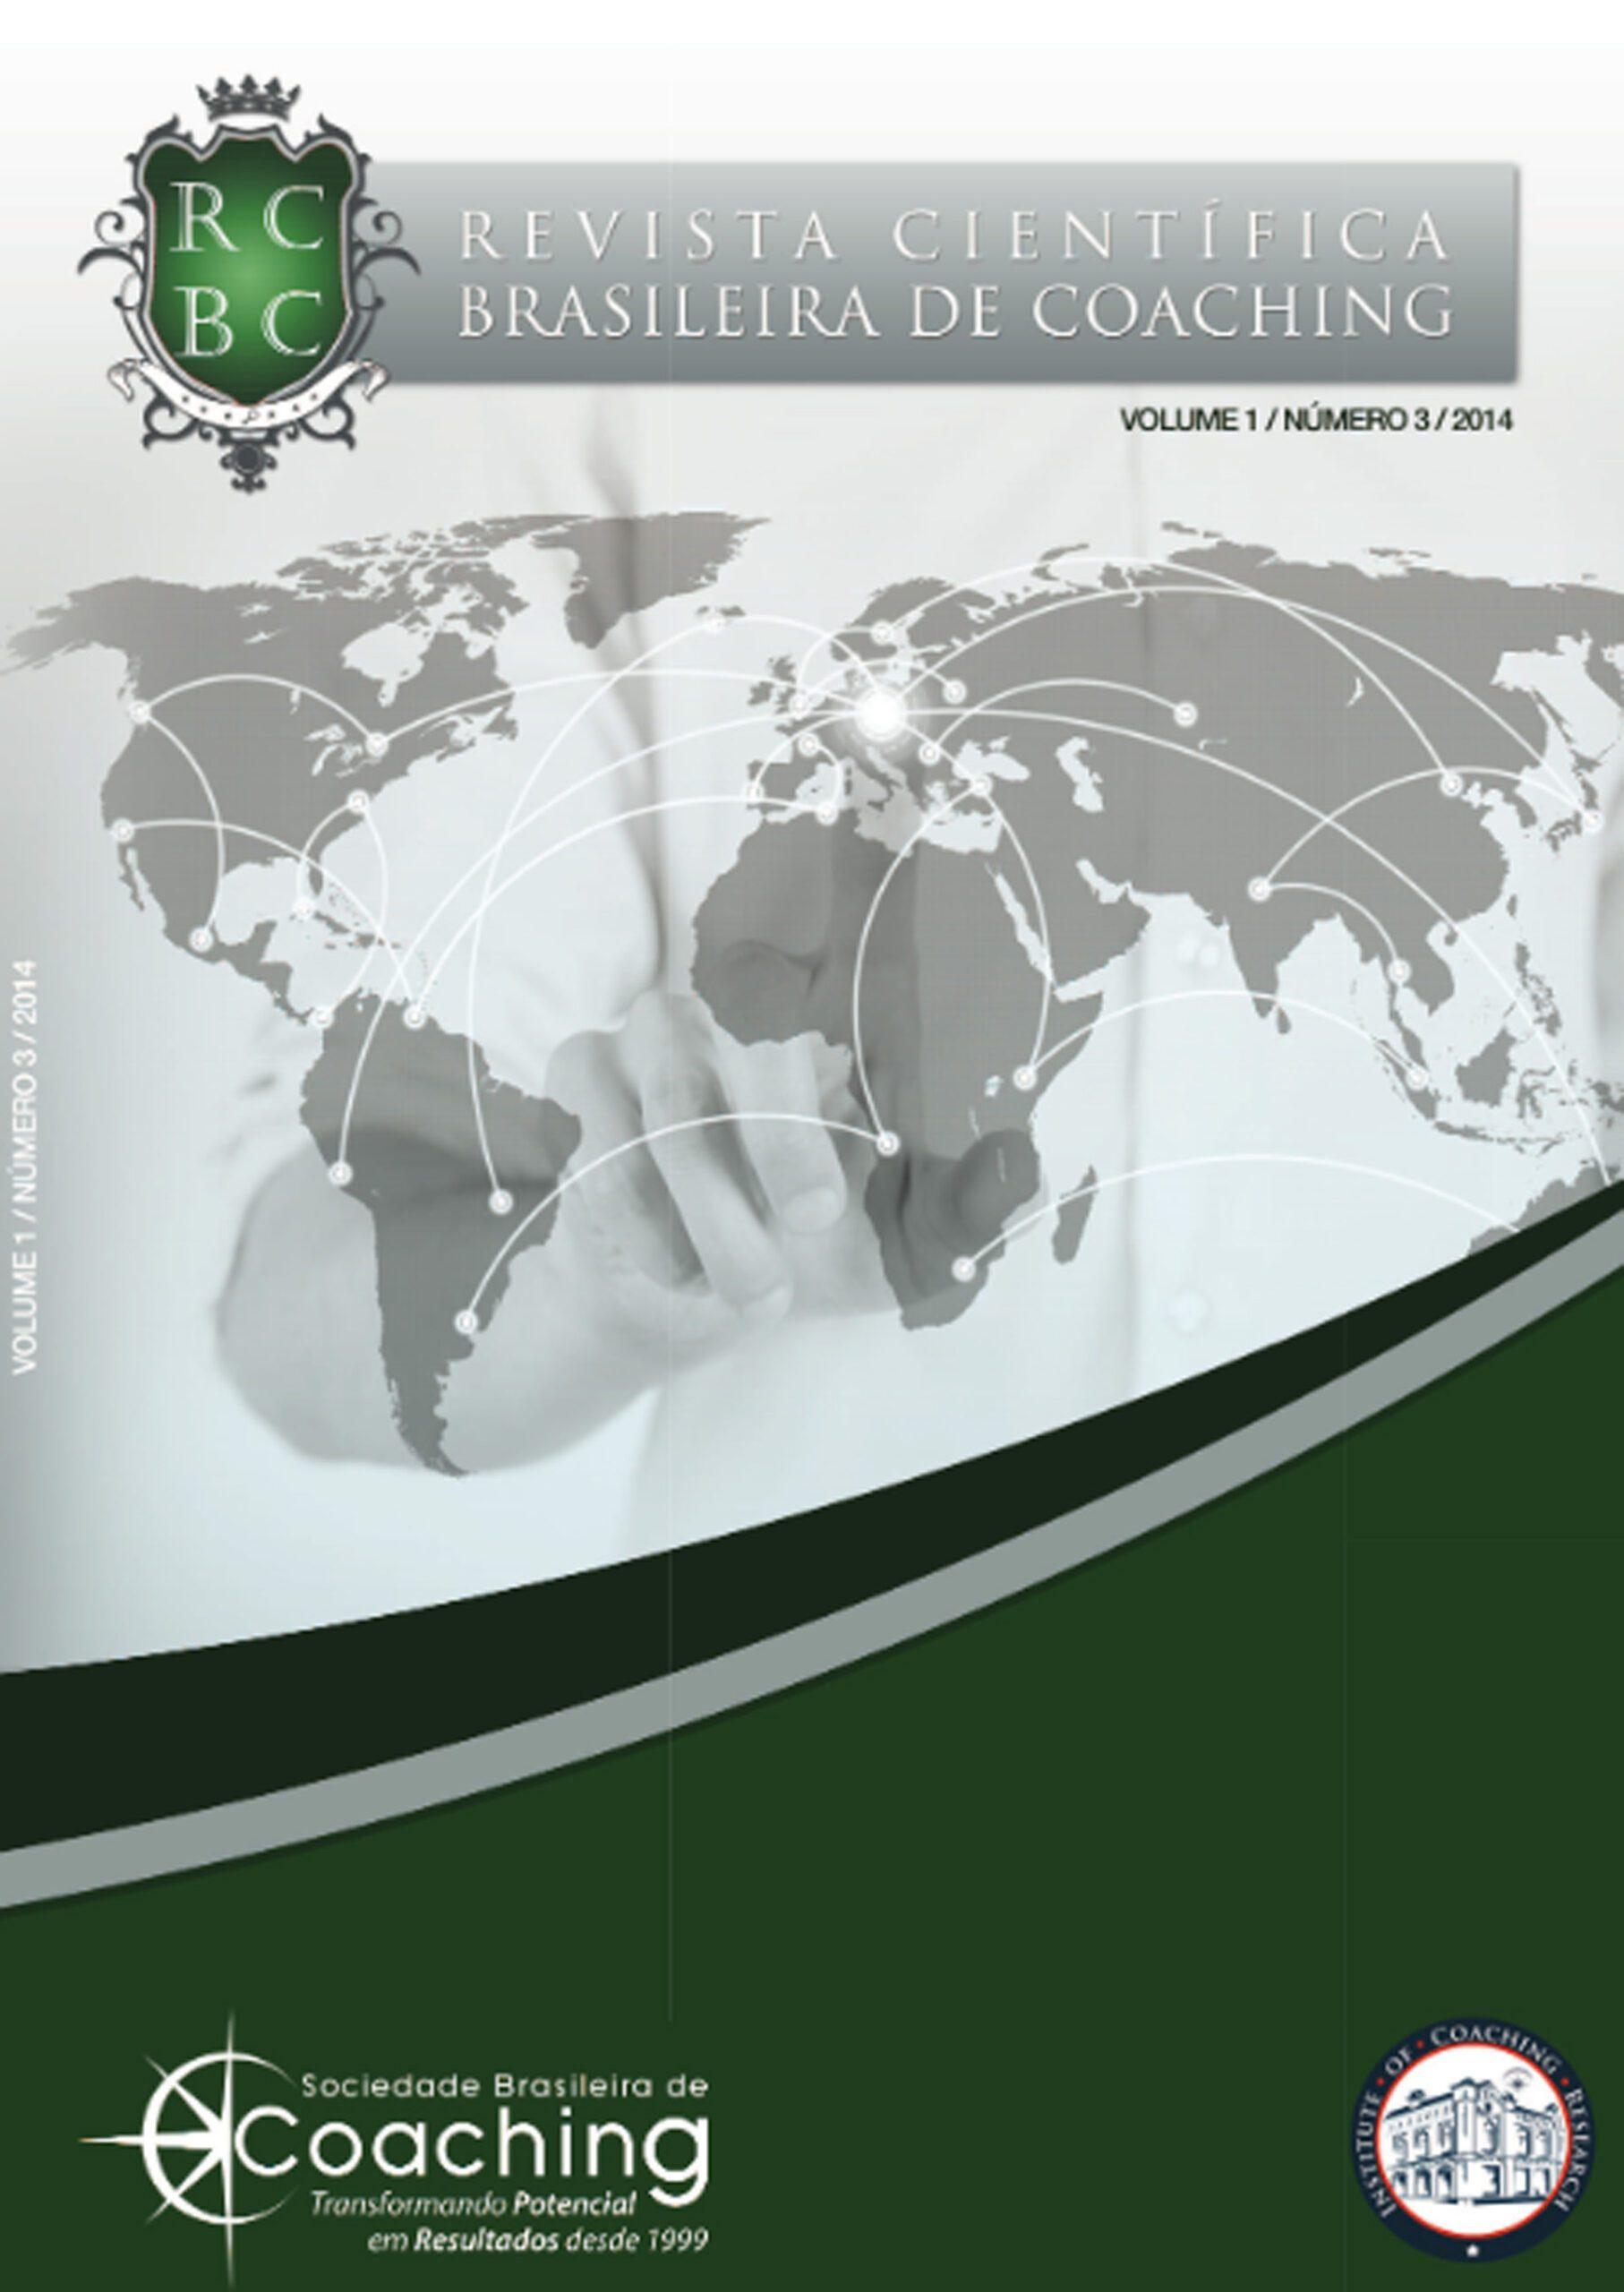 Revista Científica Brasileira de Coaching